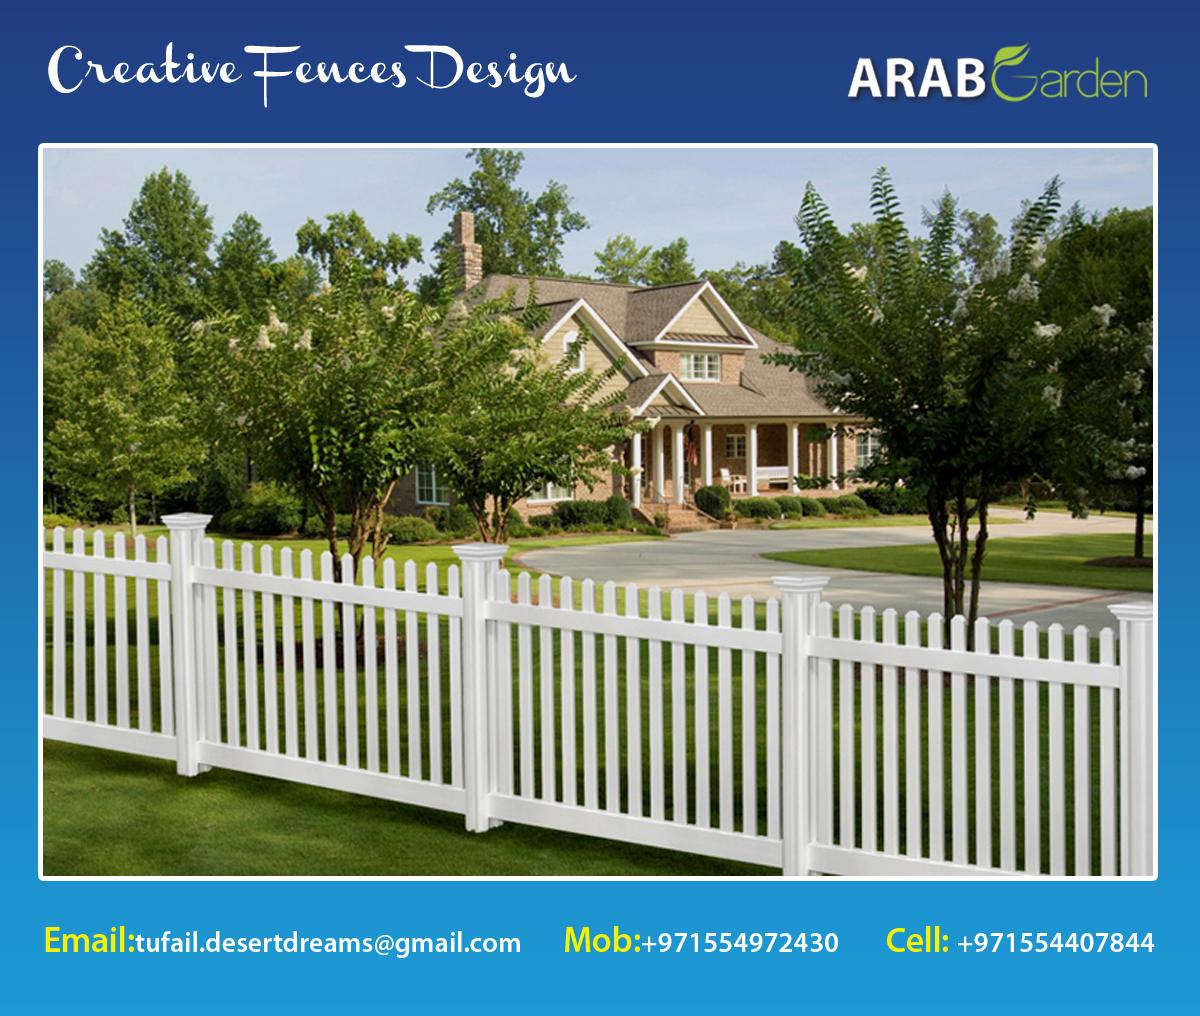 Wooden fence and gates uae smart fences farm fences garden creative fences and gates uae picket fences wooden fences garden fences wooden gates uae baanklon Image collections